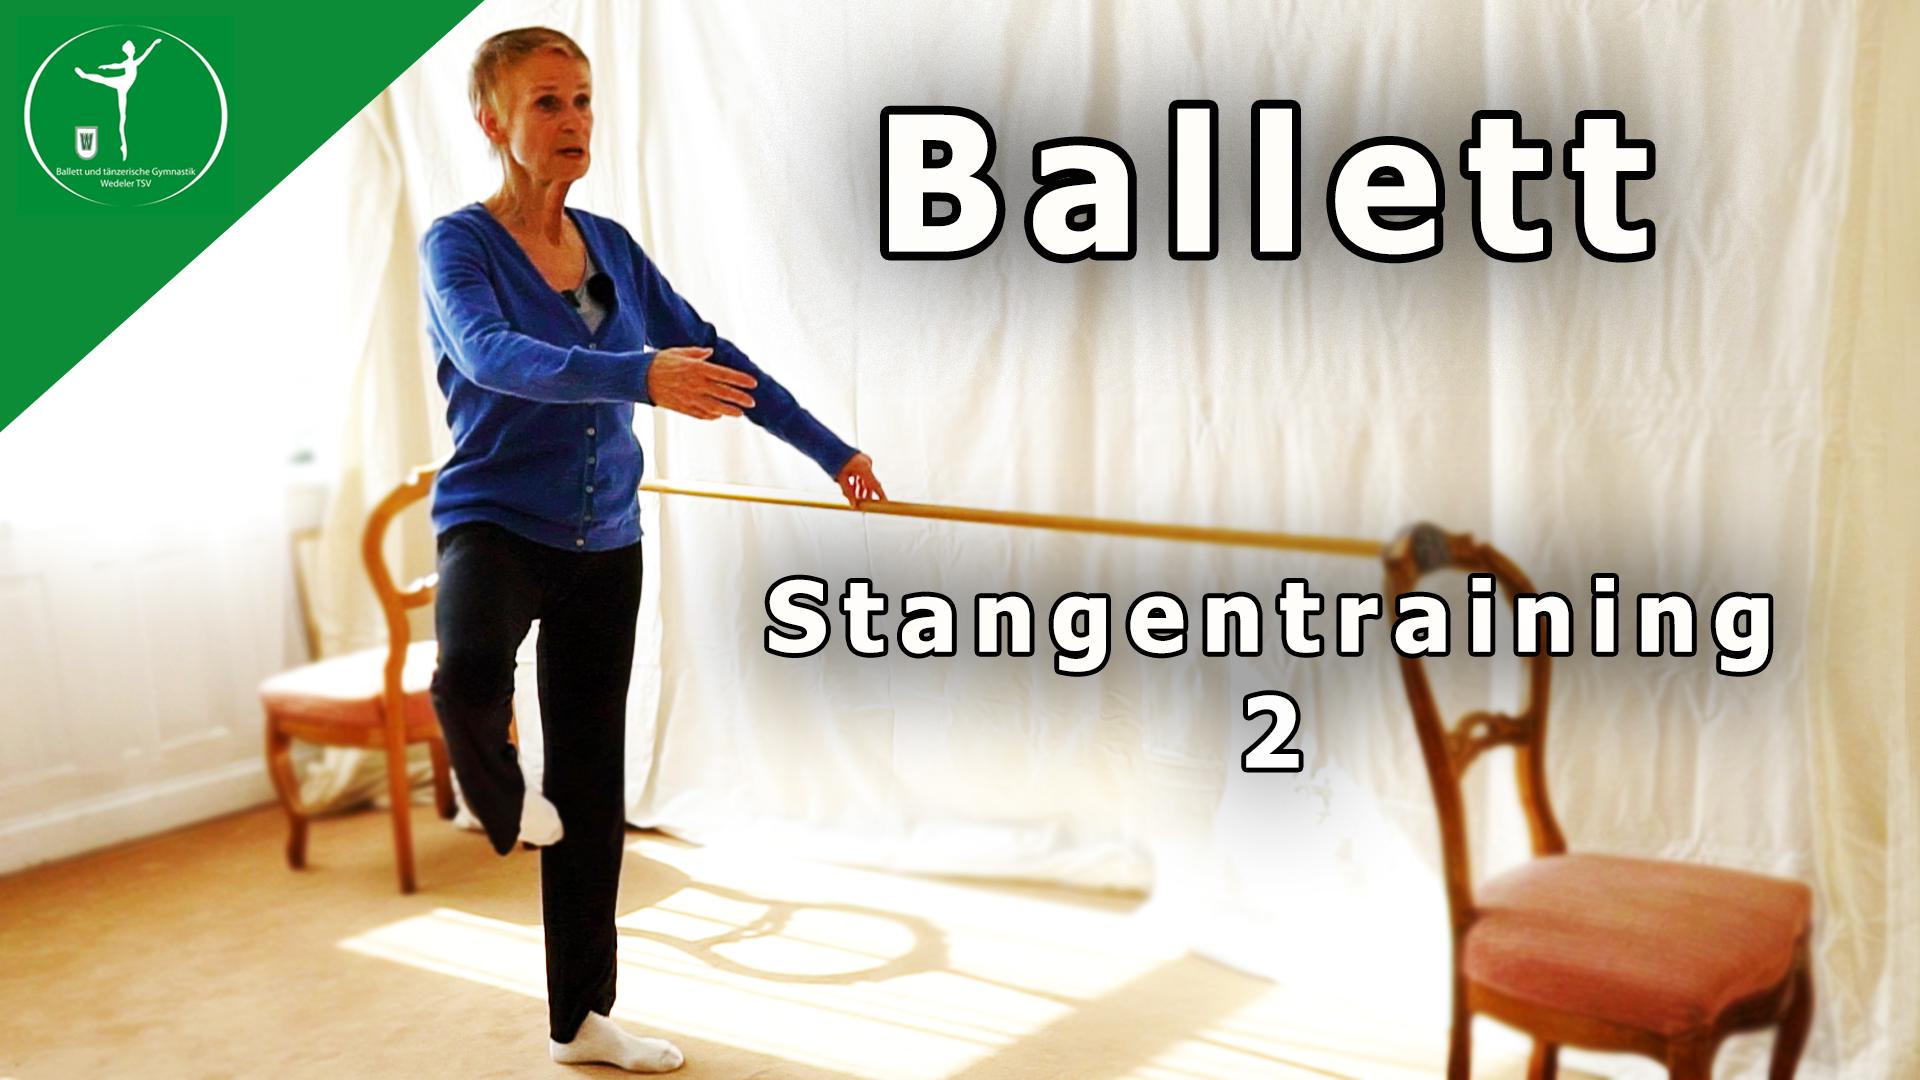 Ballett – Stangentraining 2 | Ein 15 Minuten Hometraining